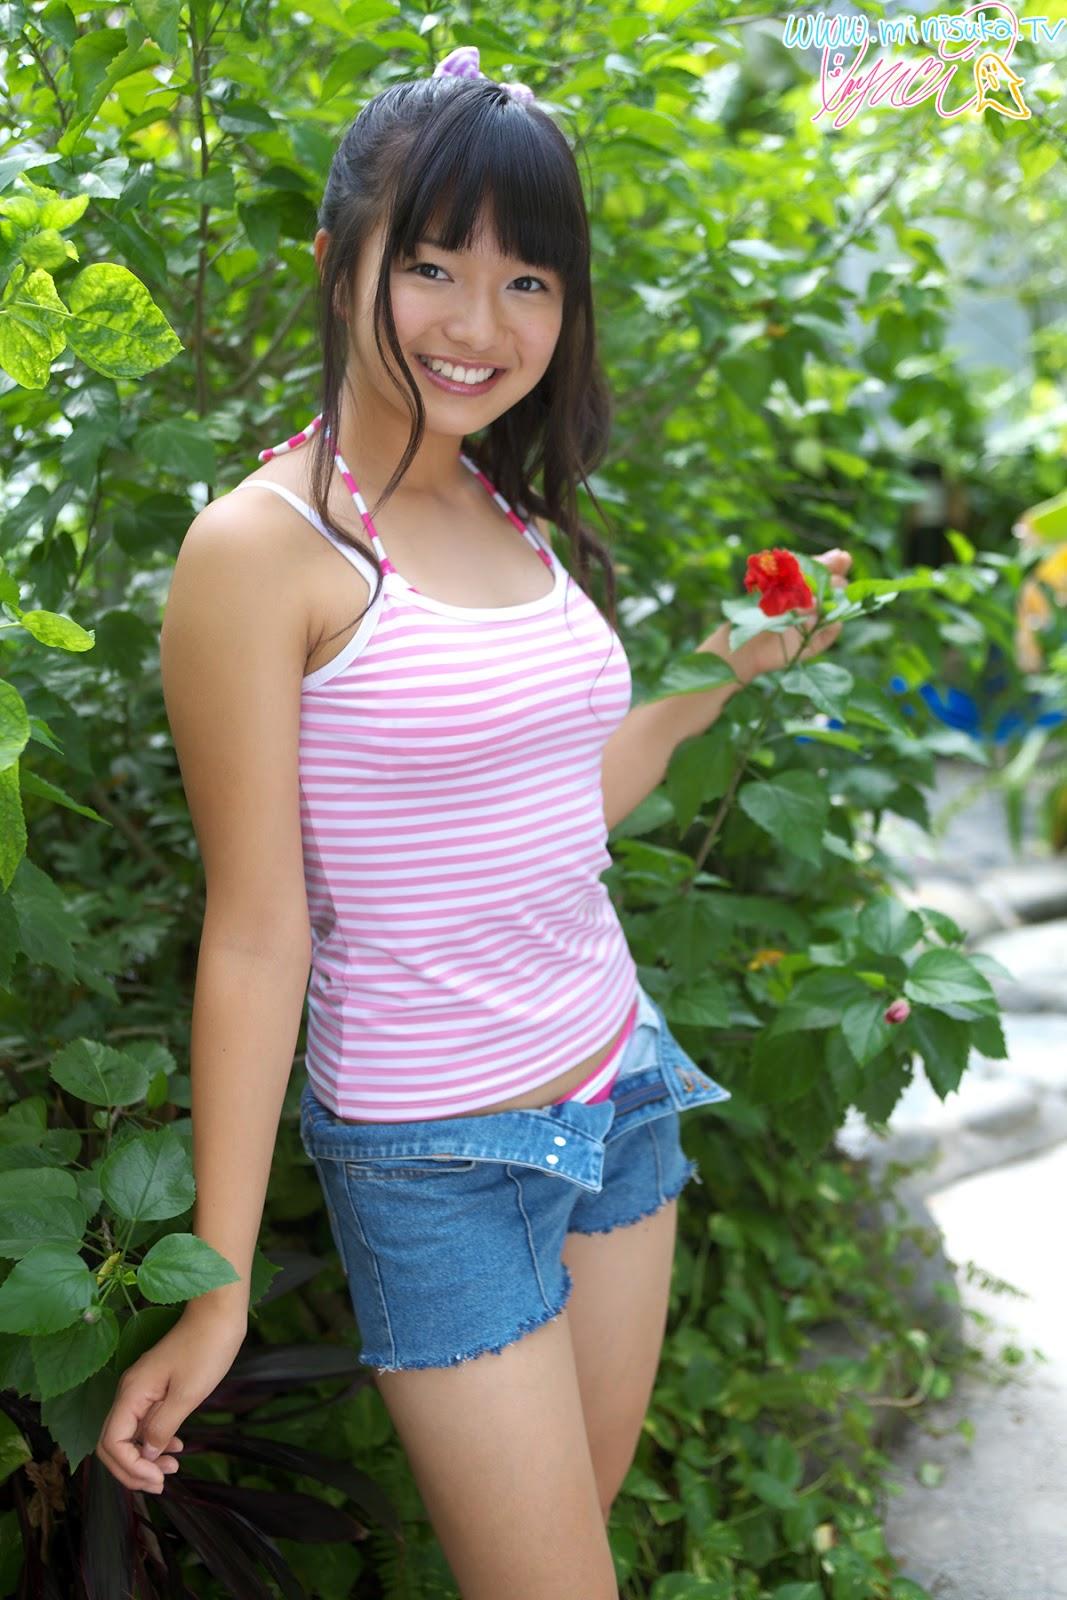 binaries young asian Alt